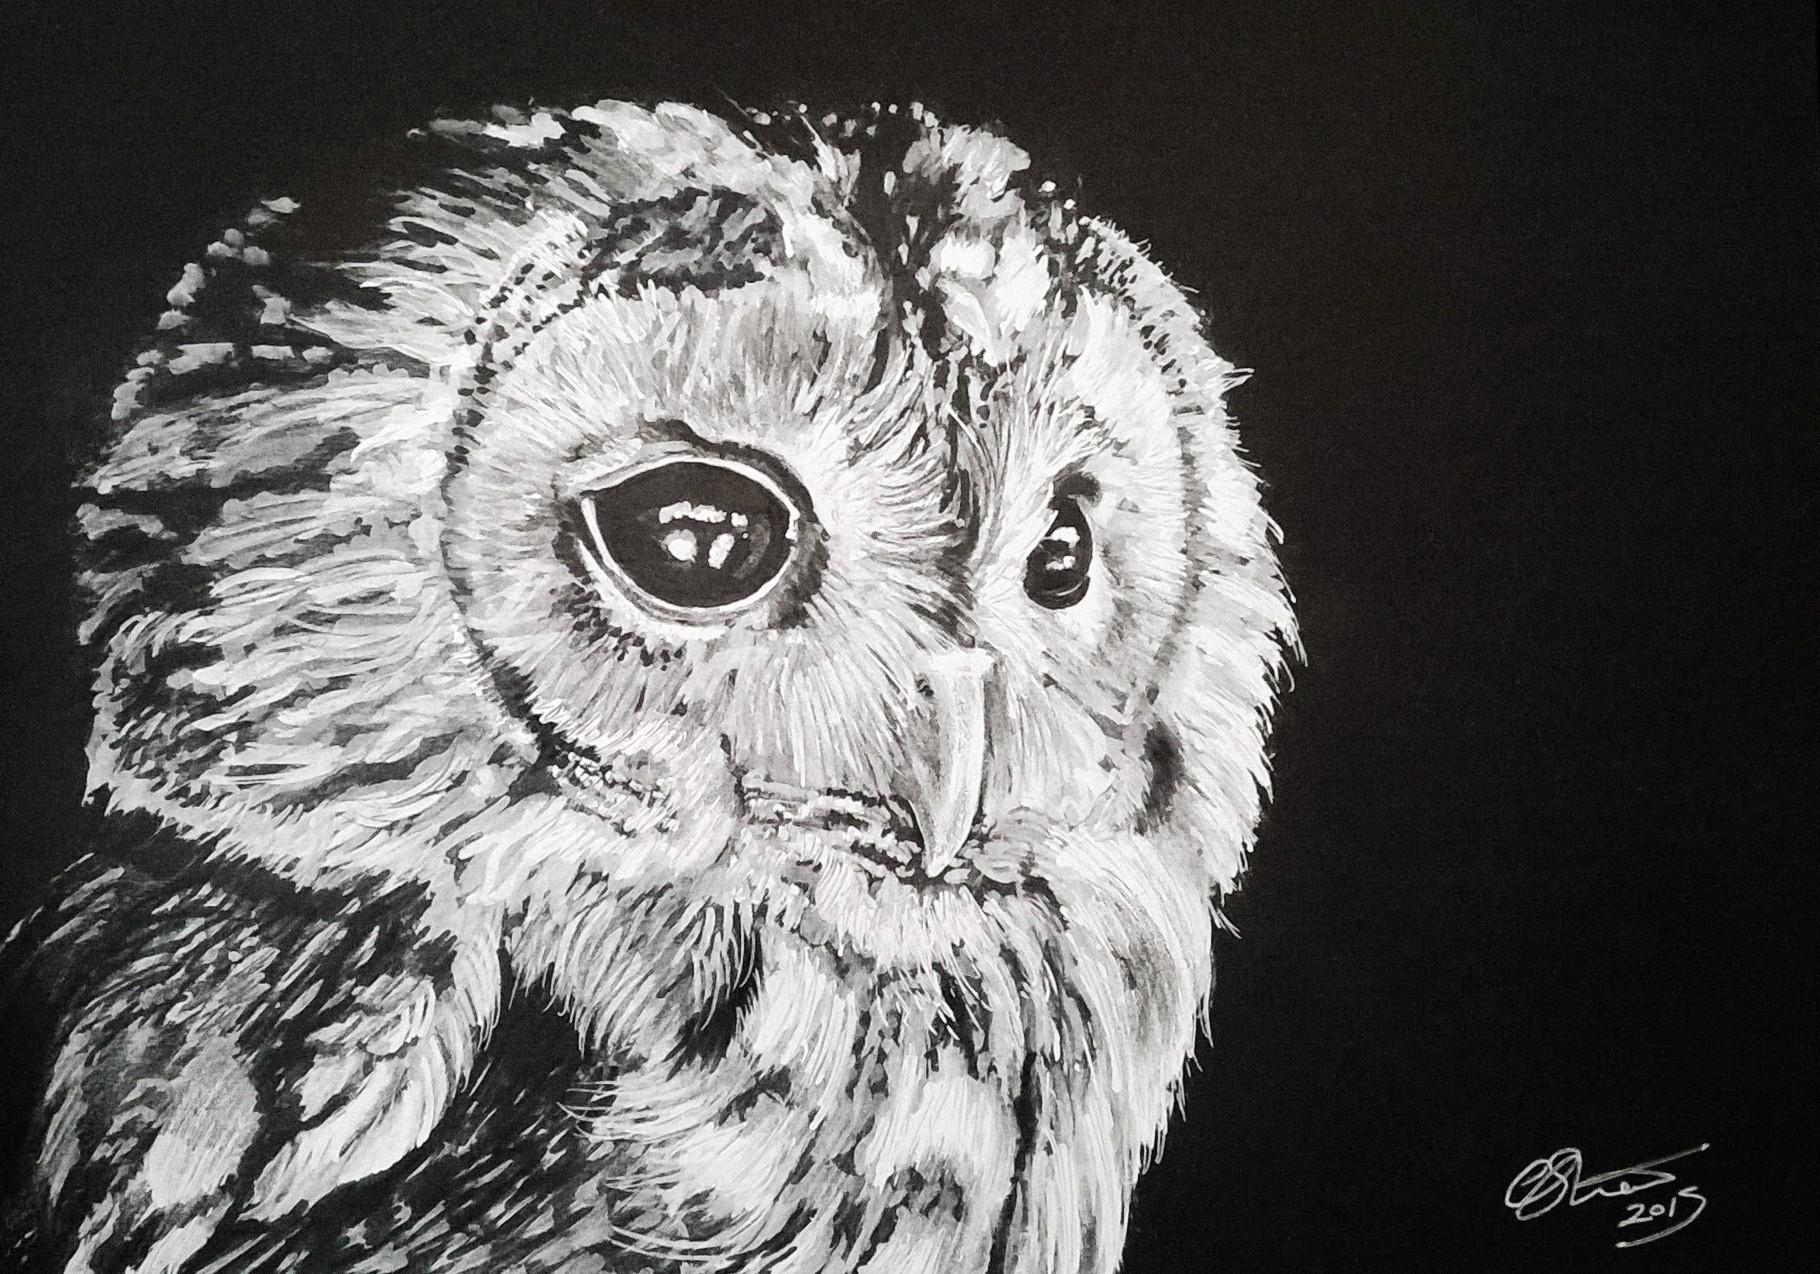 Monochrome Owl